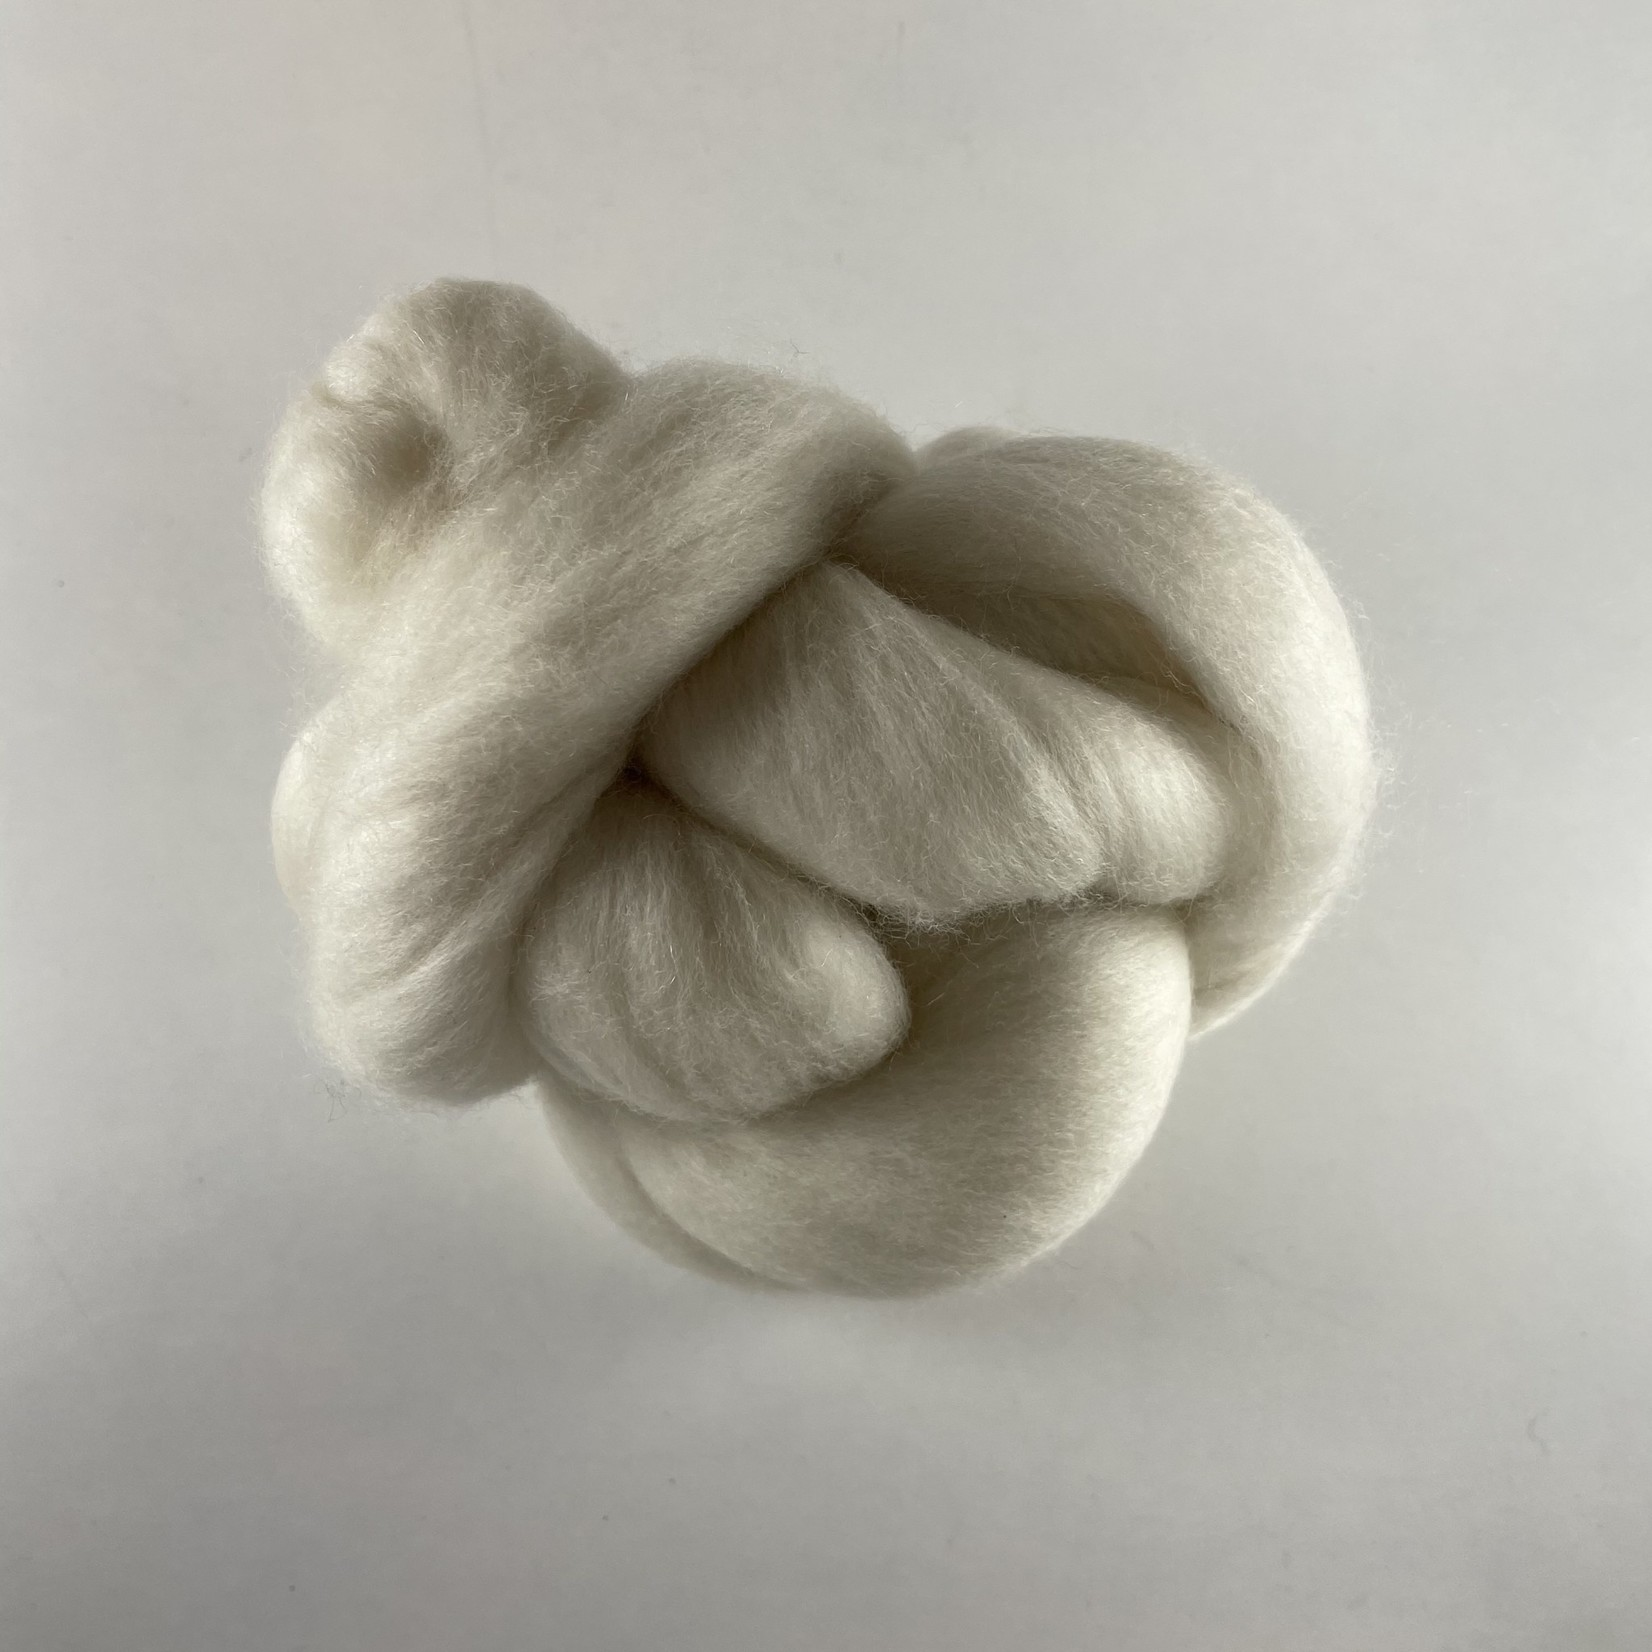 Fleece Artist Merino Sliver by Fleece Artist